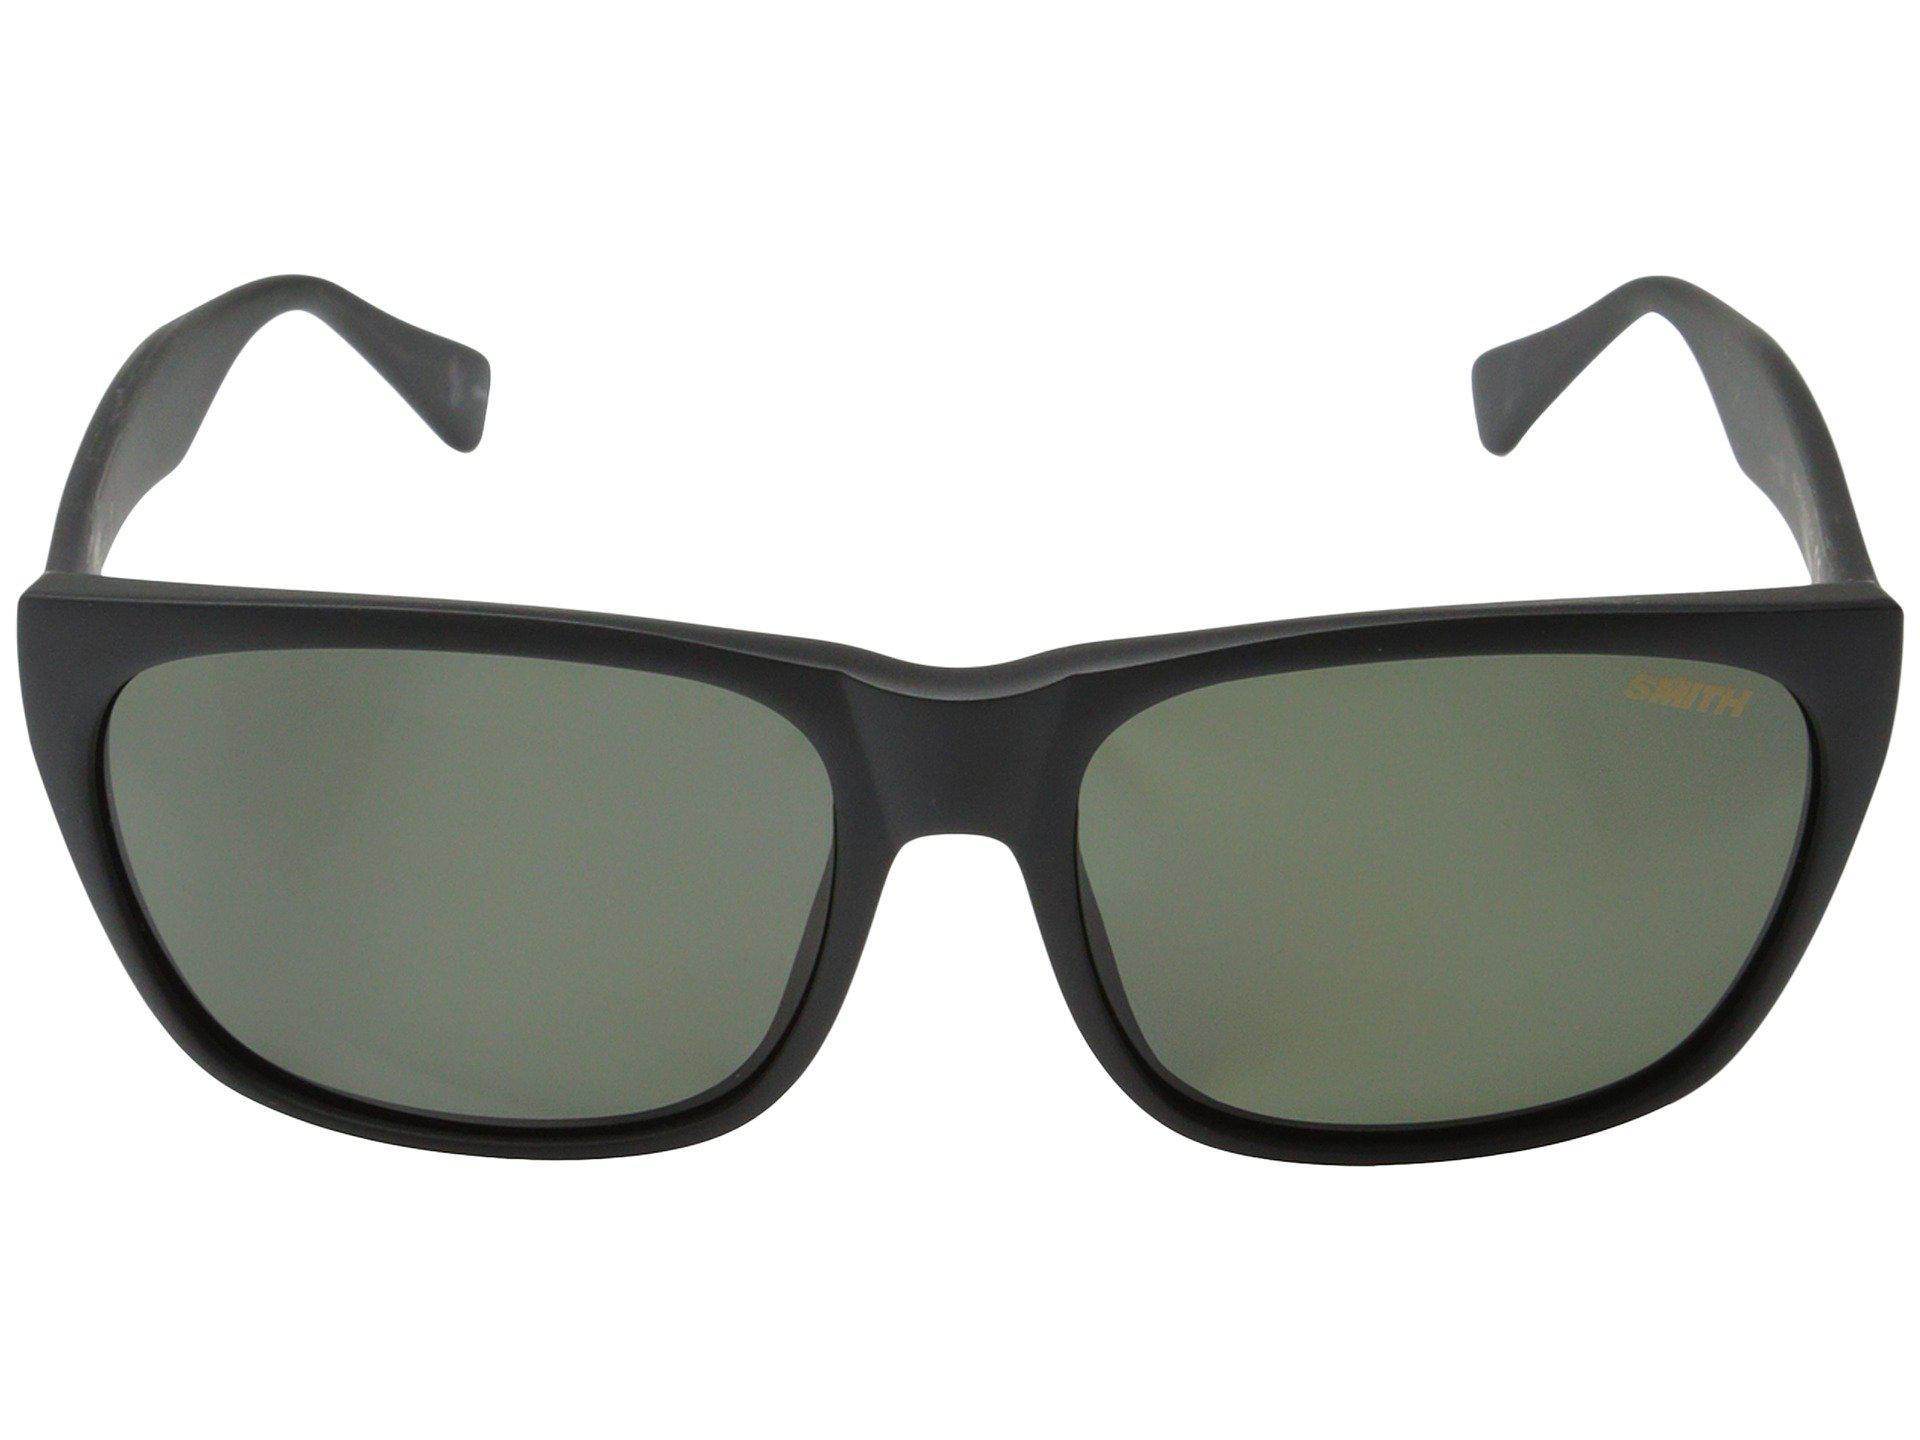 91e597b4ef Smith Optics - Tioga (matte Black polar Gray Green Carbonic Tlt Lenses)  Fashion. View fullscreen